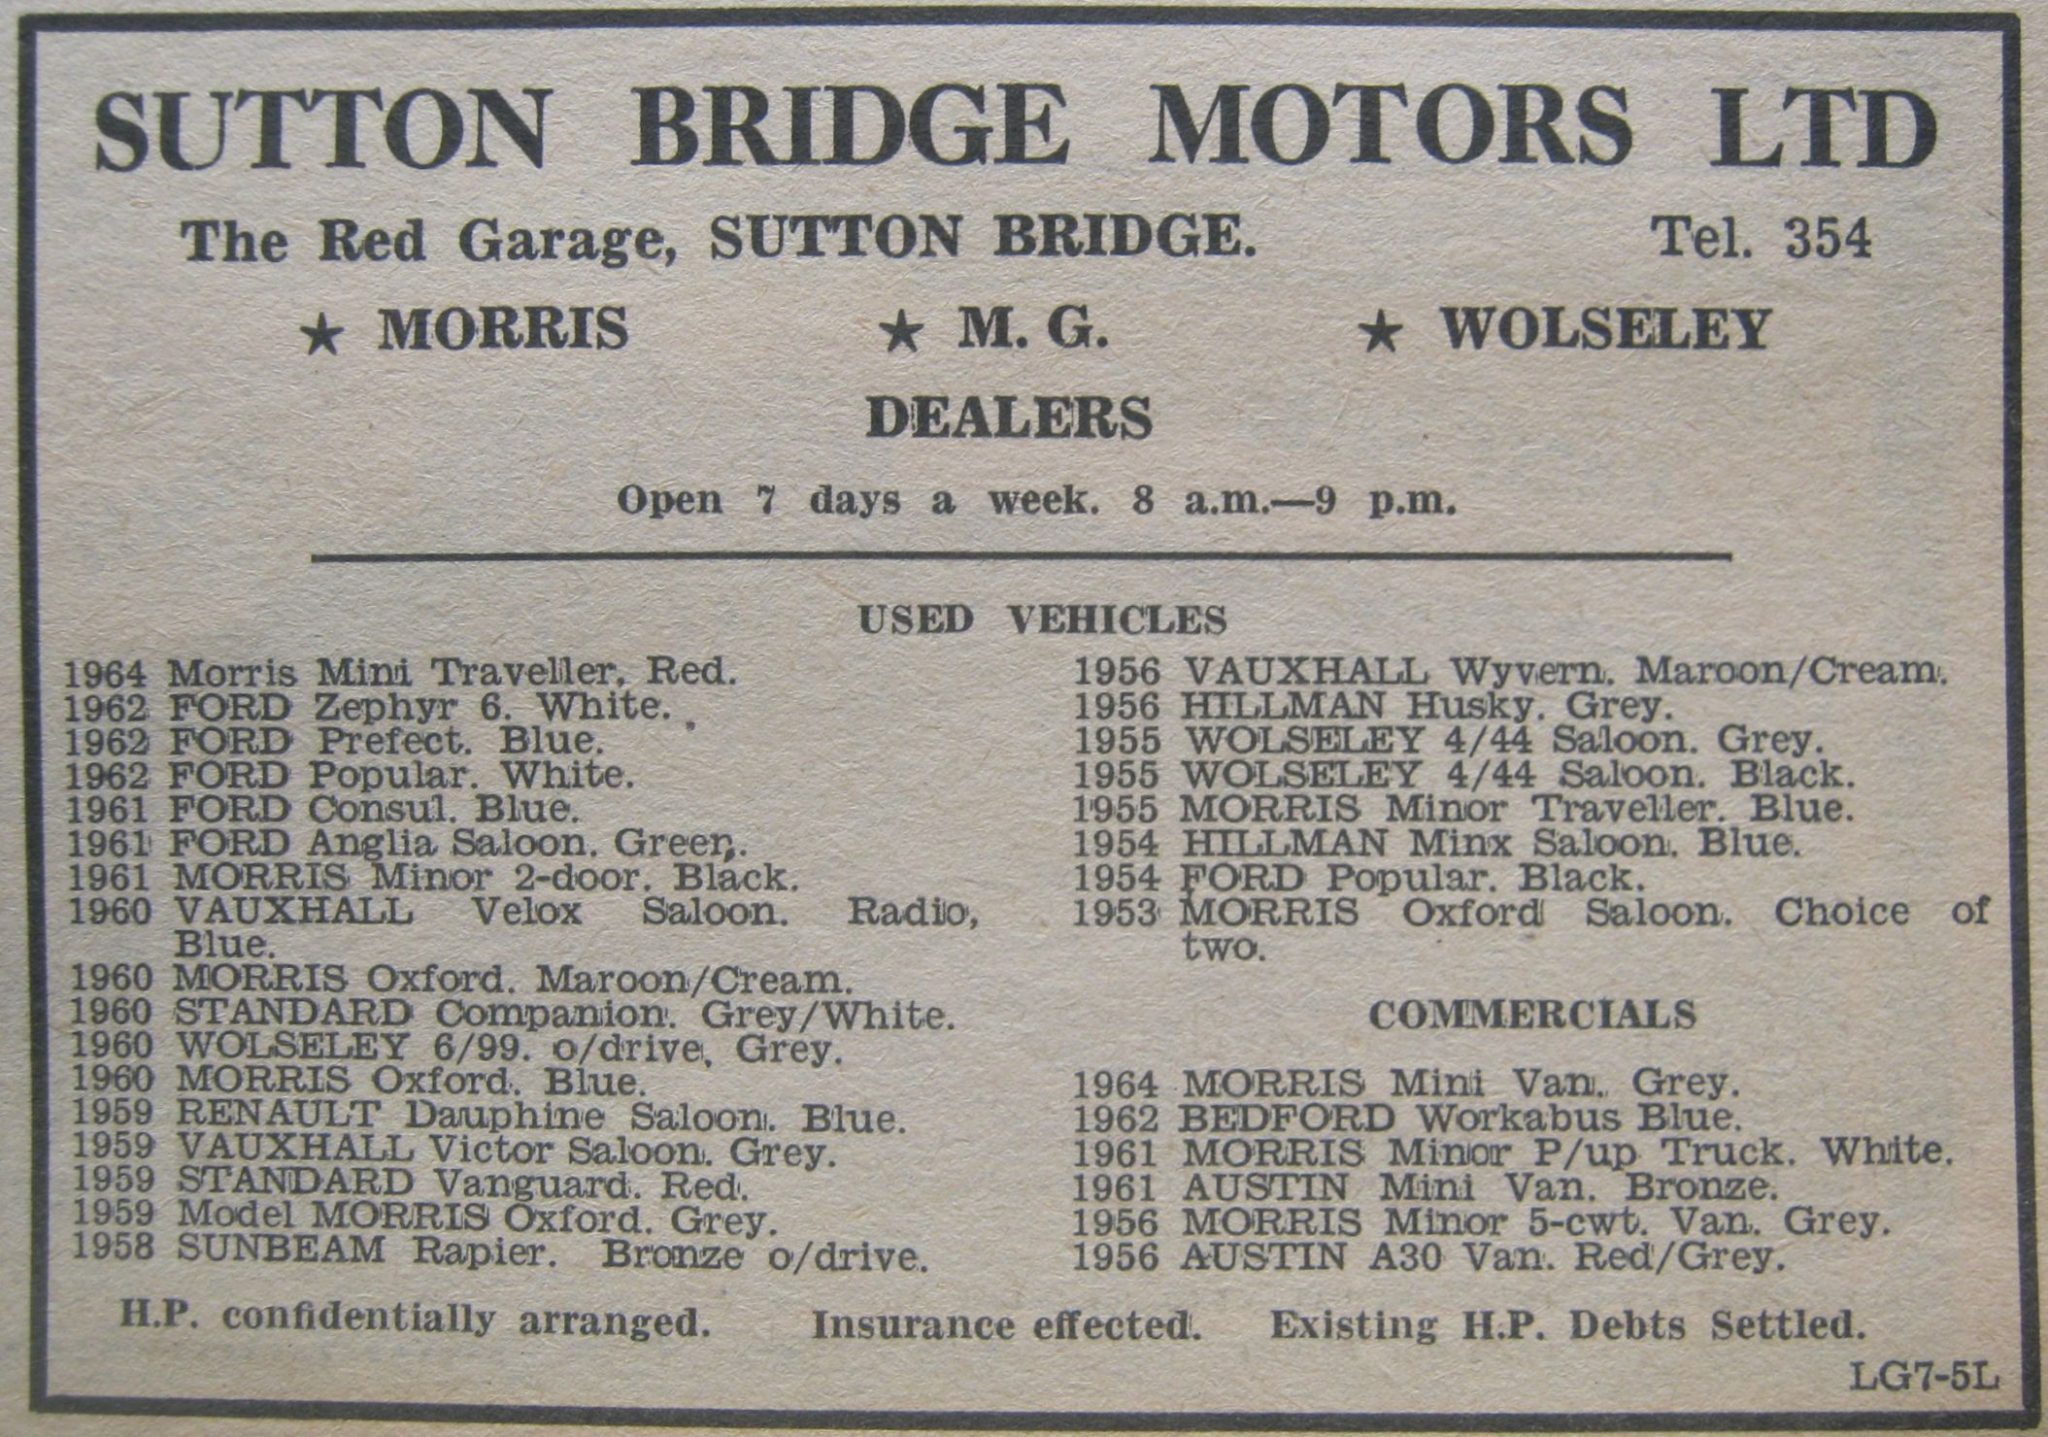 Sutton Bridge Motors advert 1965